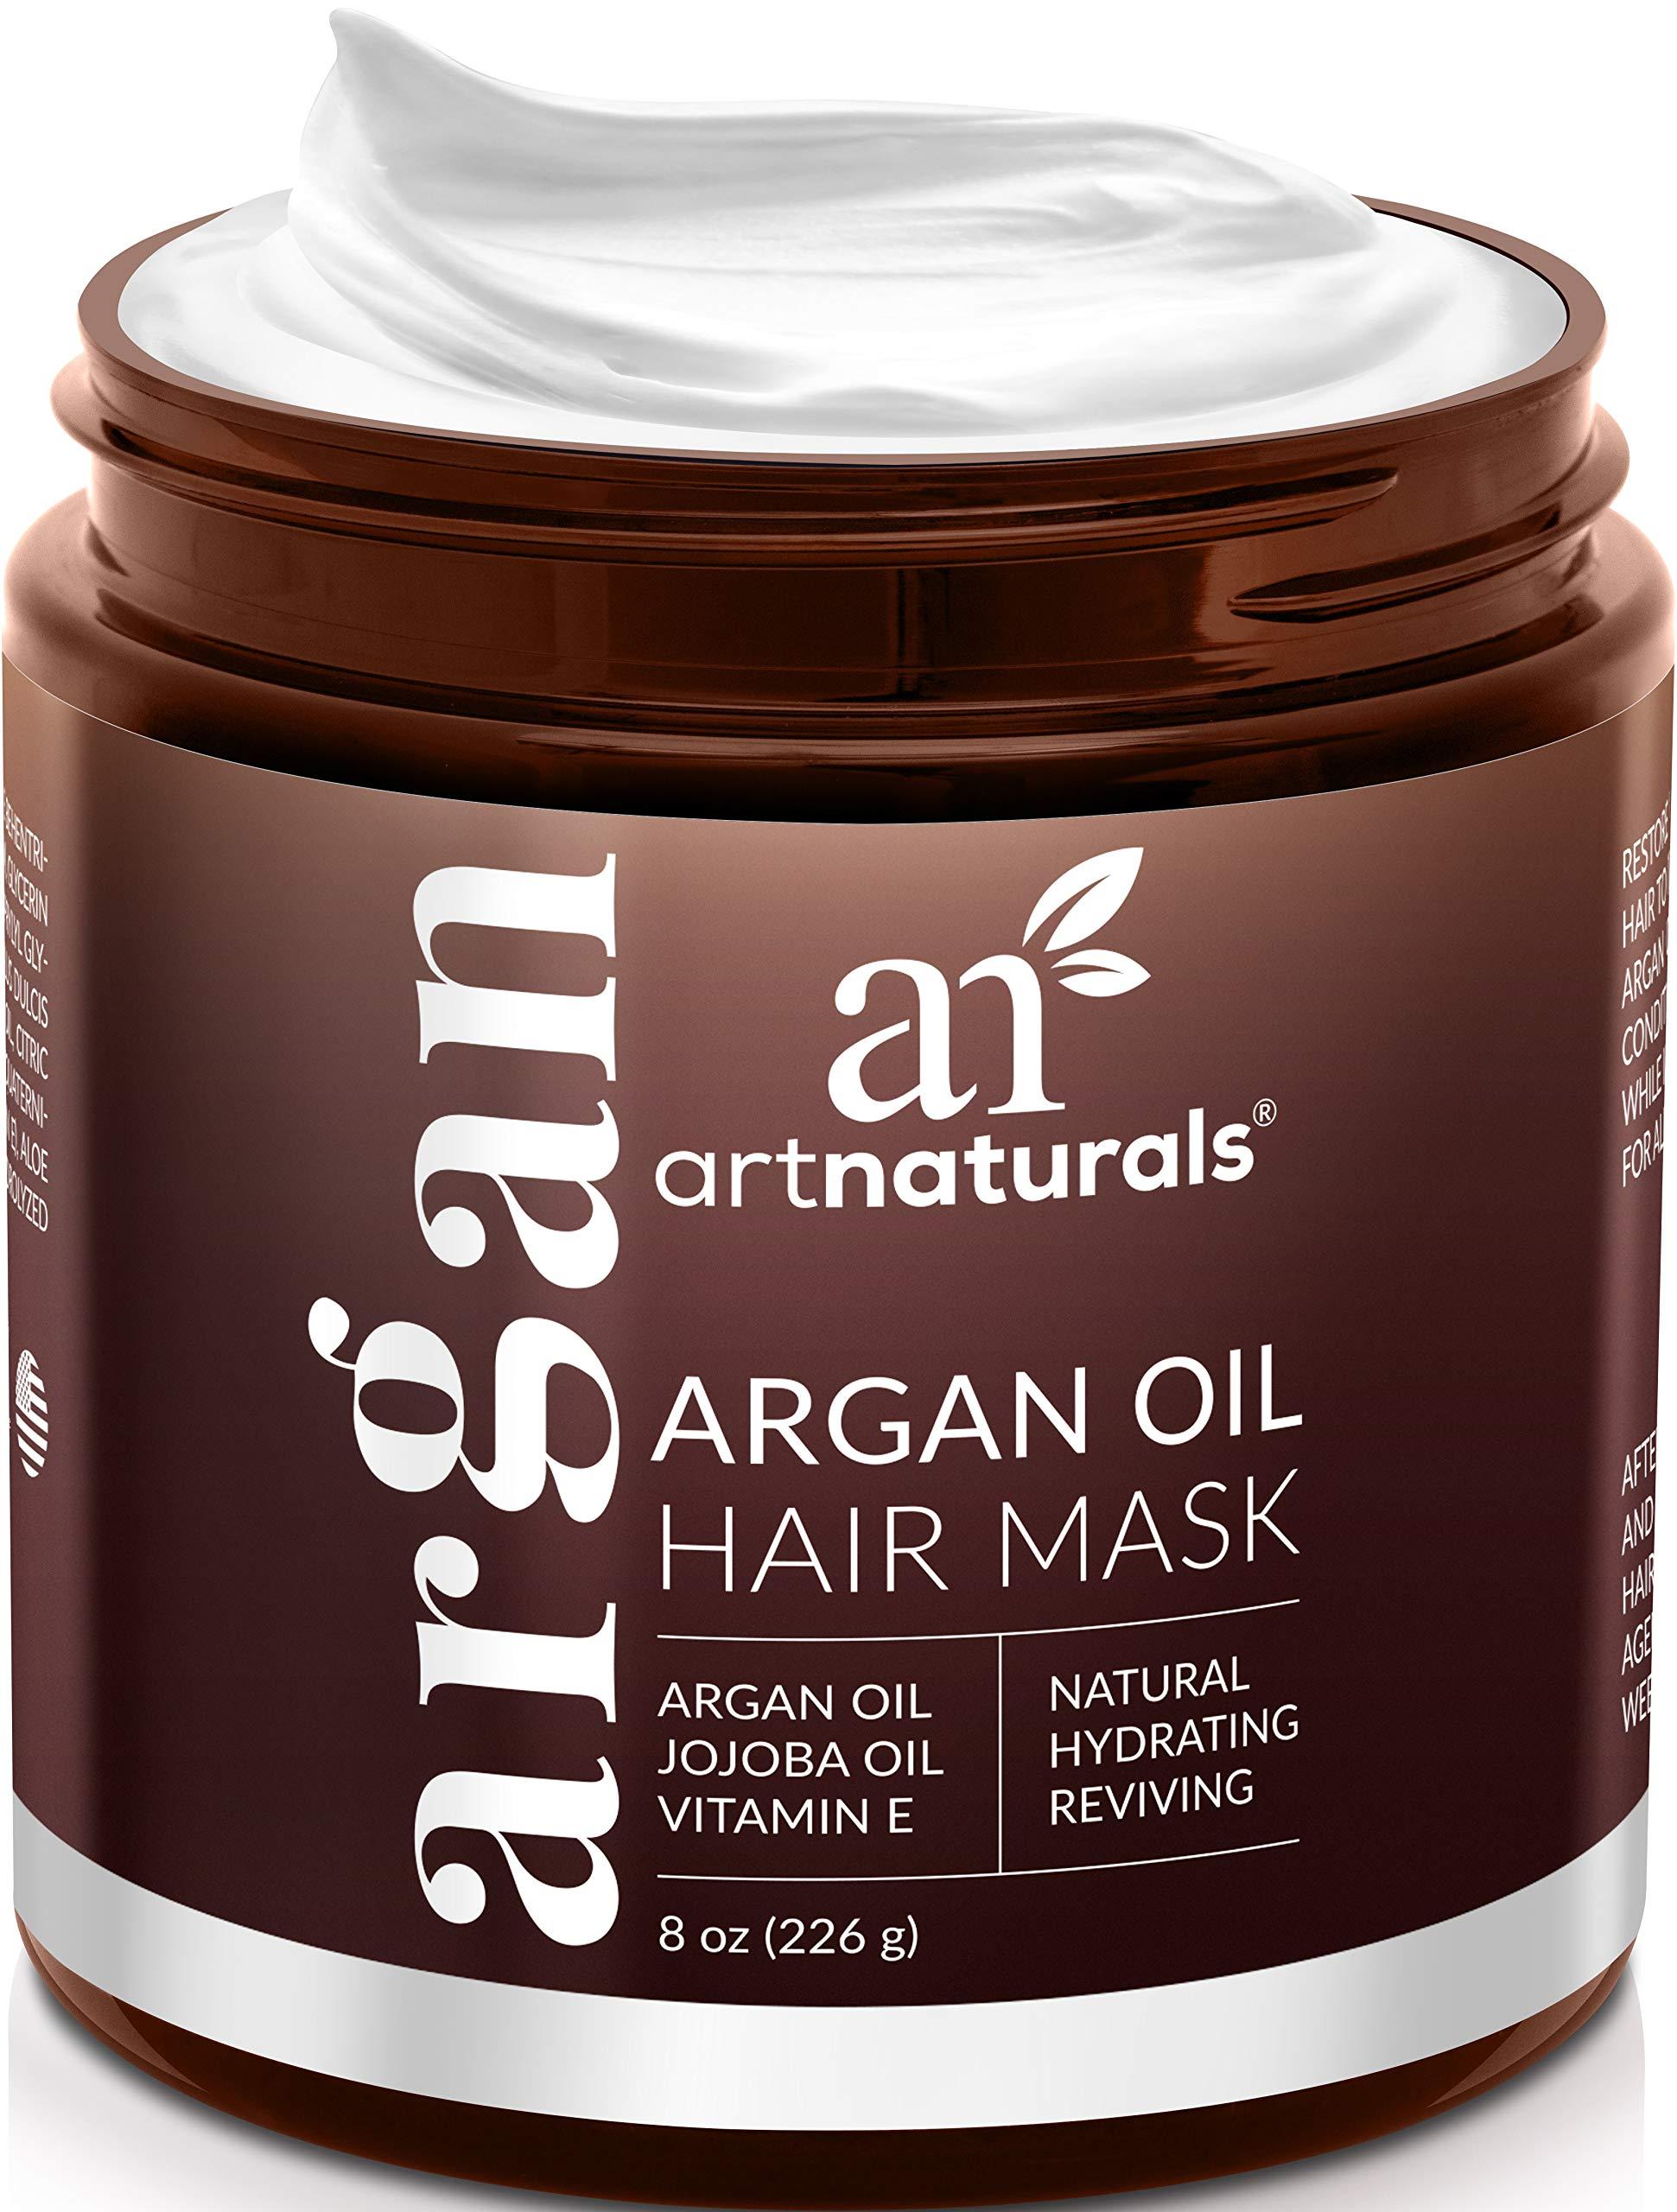 ArtNaturals Argan Oil Hair Mask